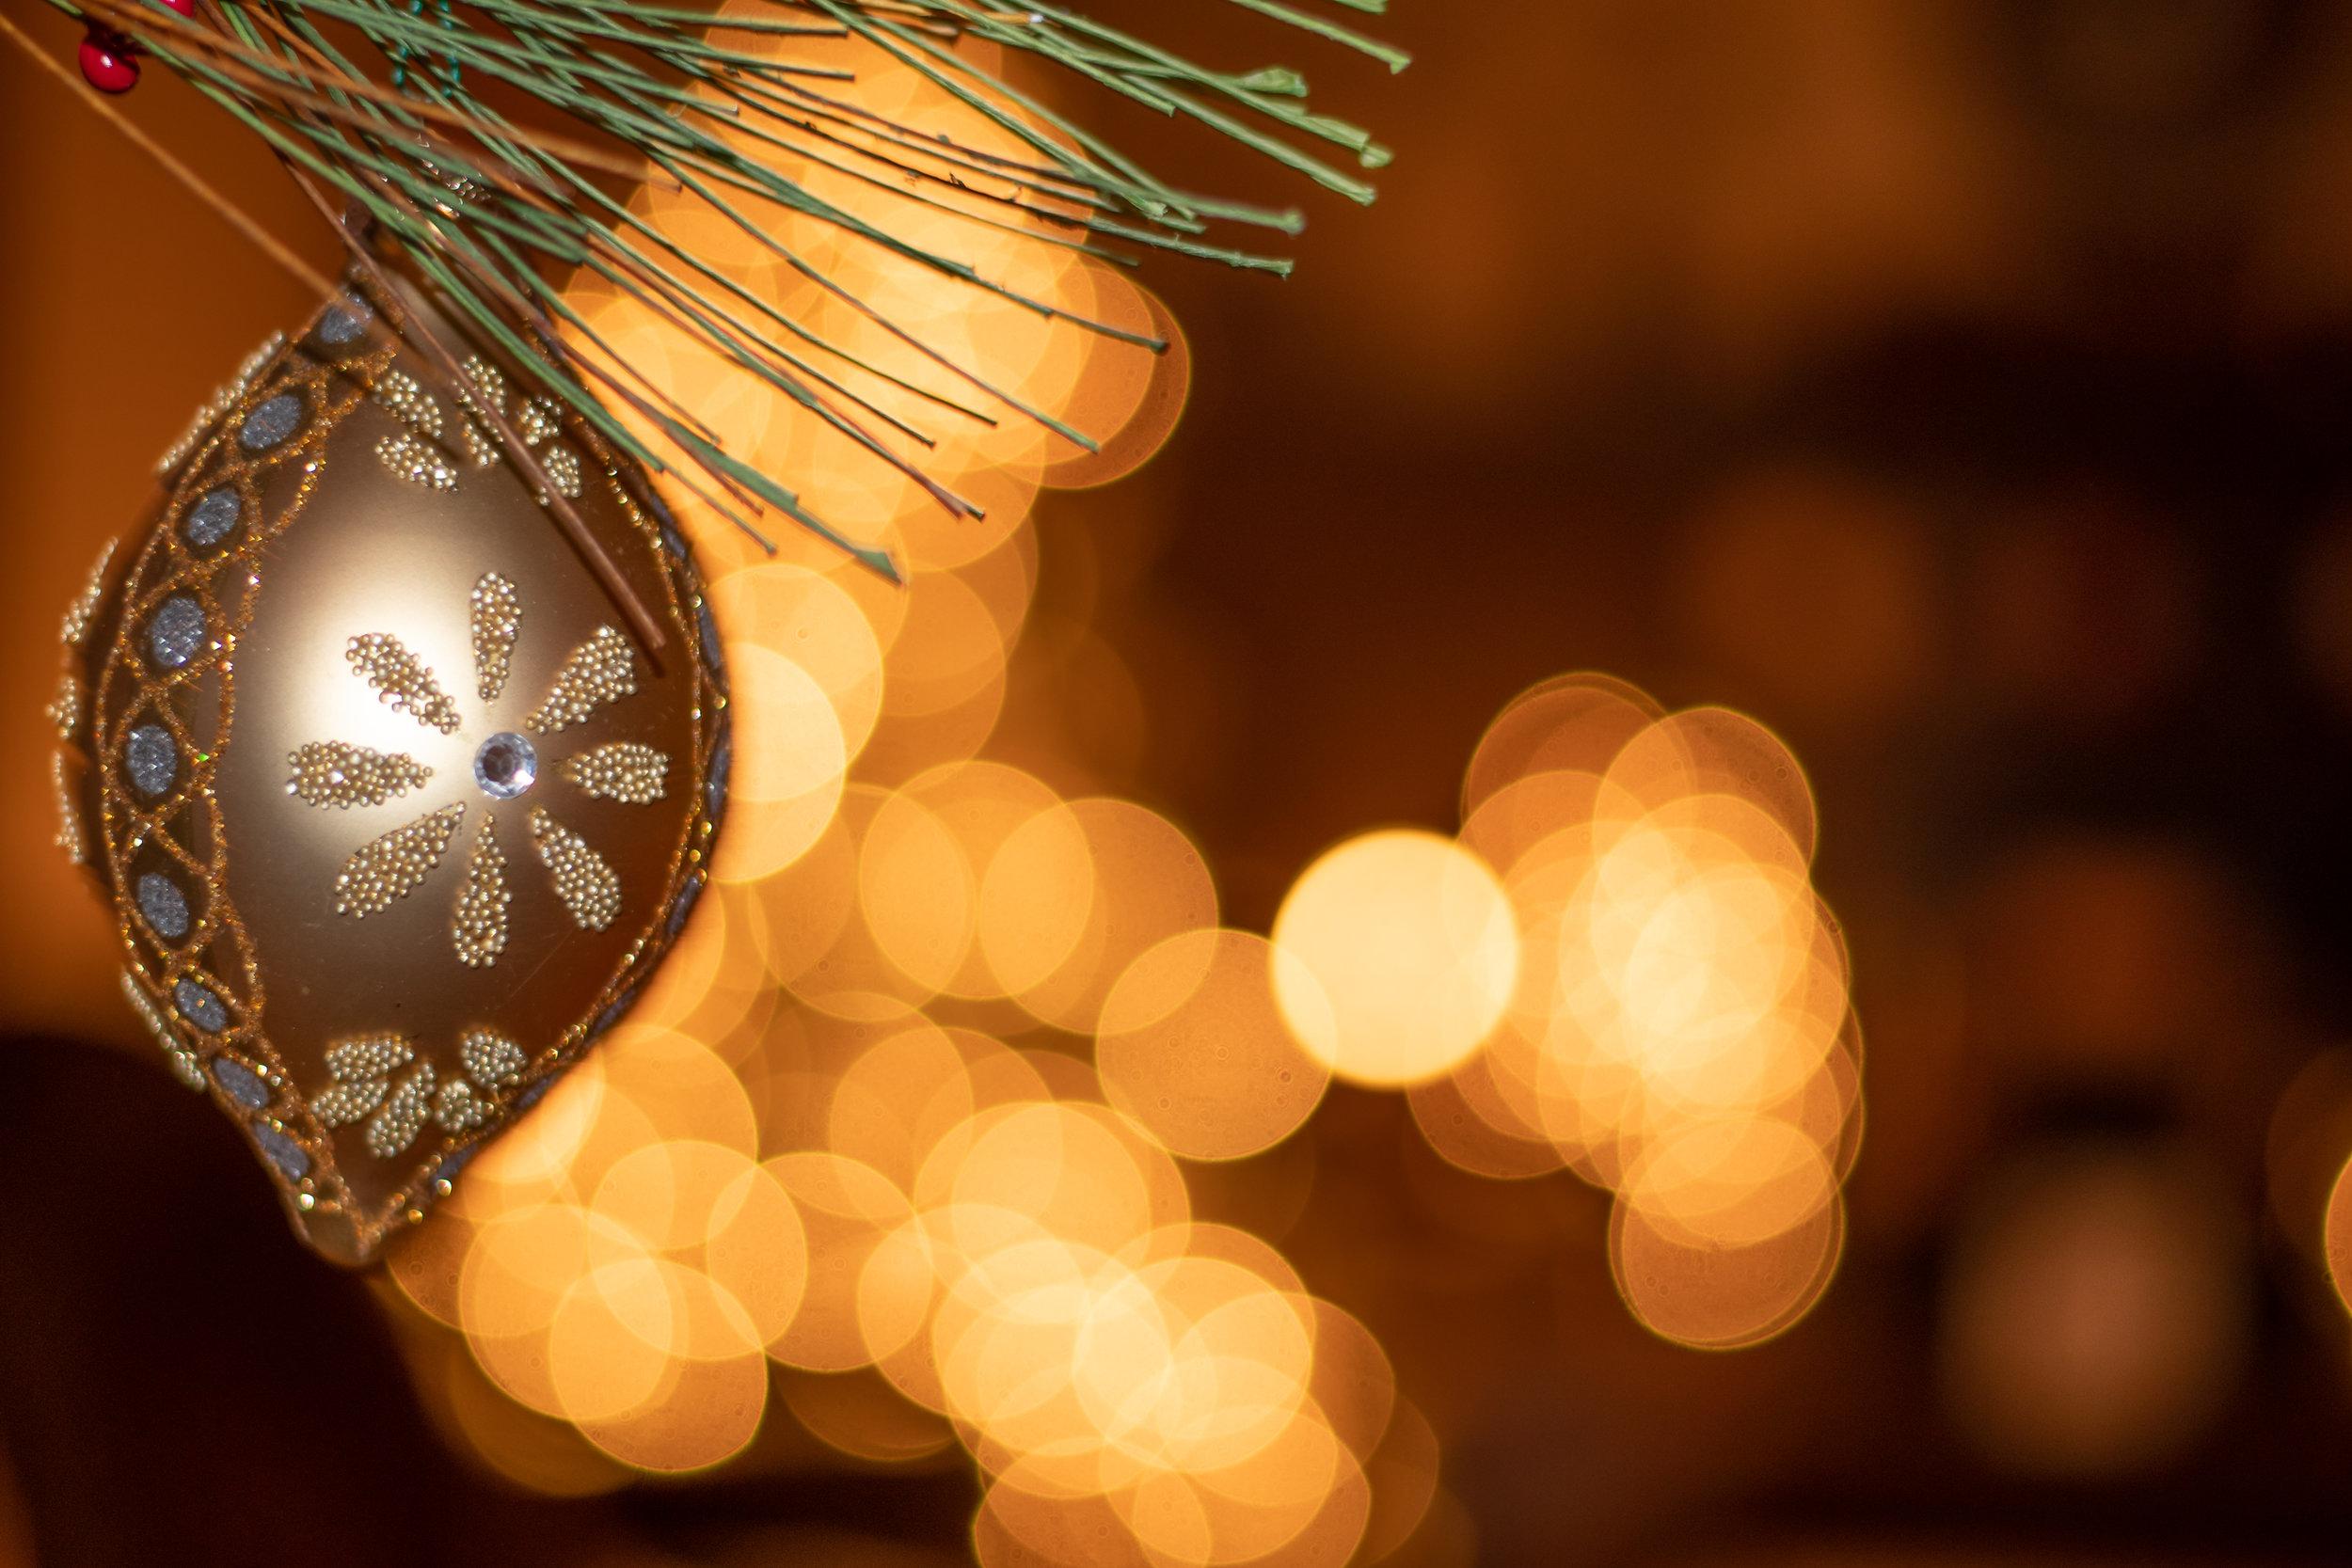 Christmas Ornaments (7 of 10).jpg